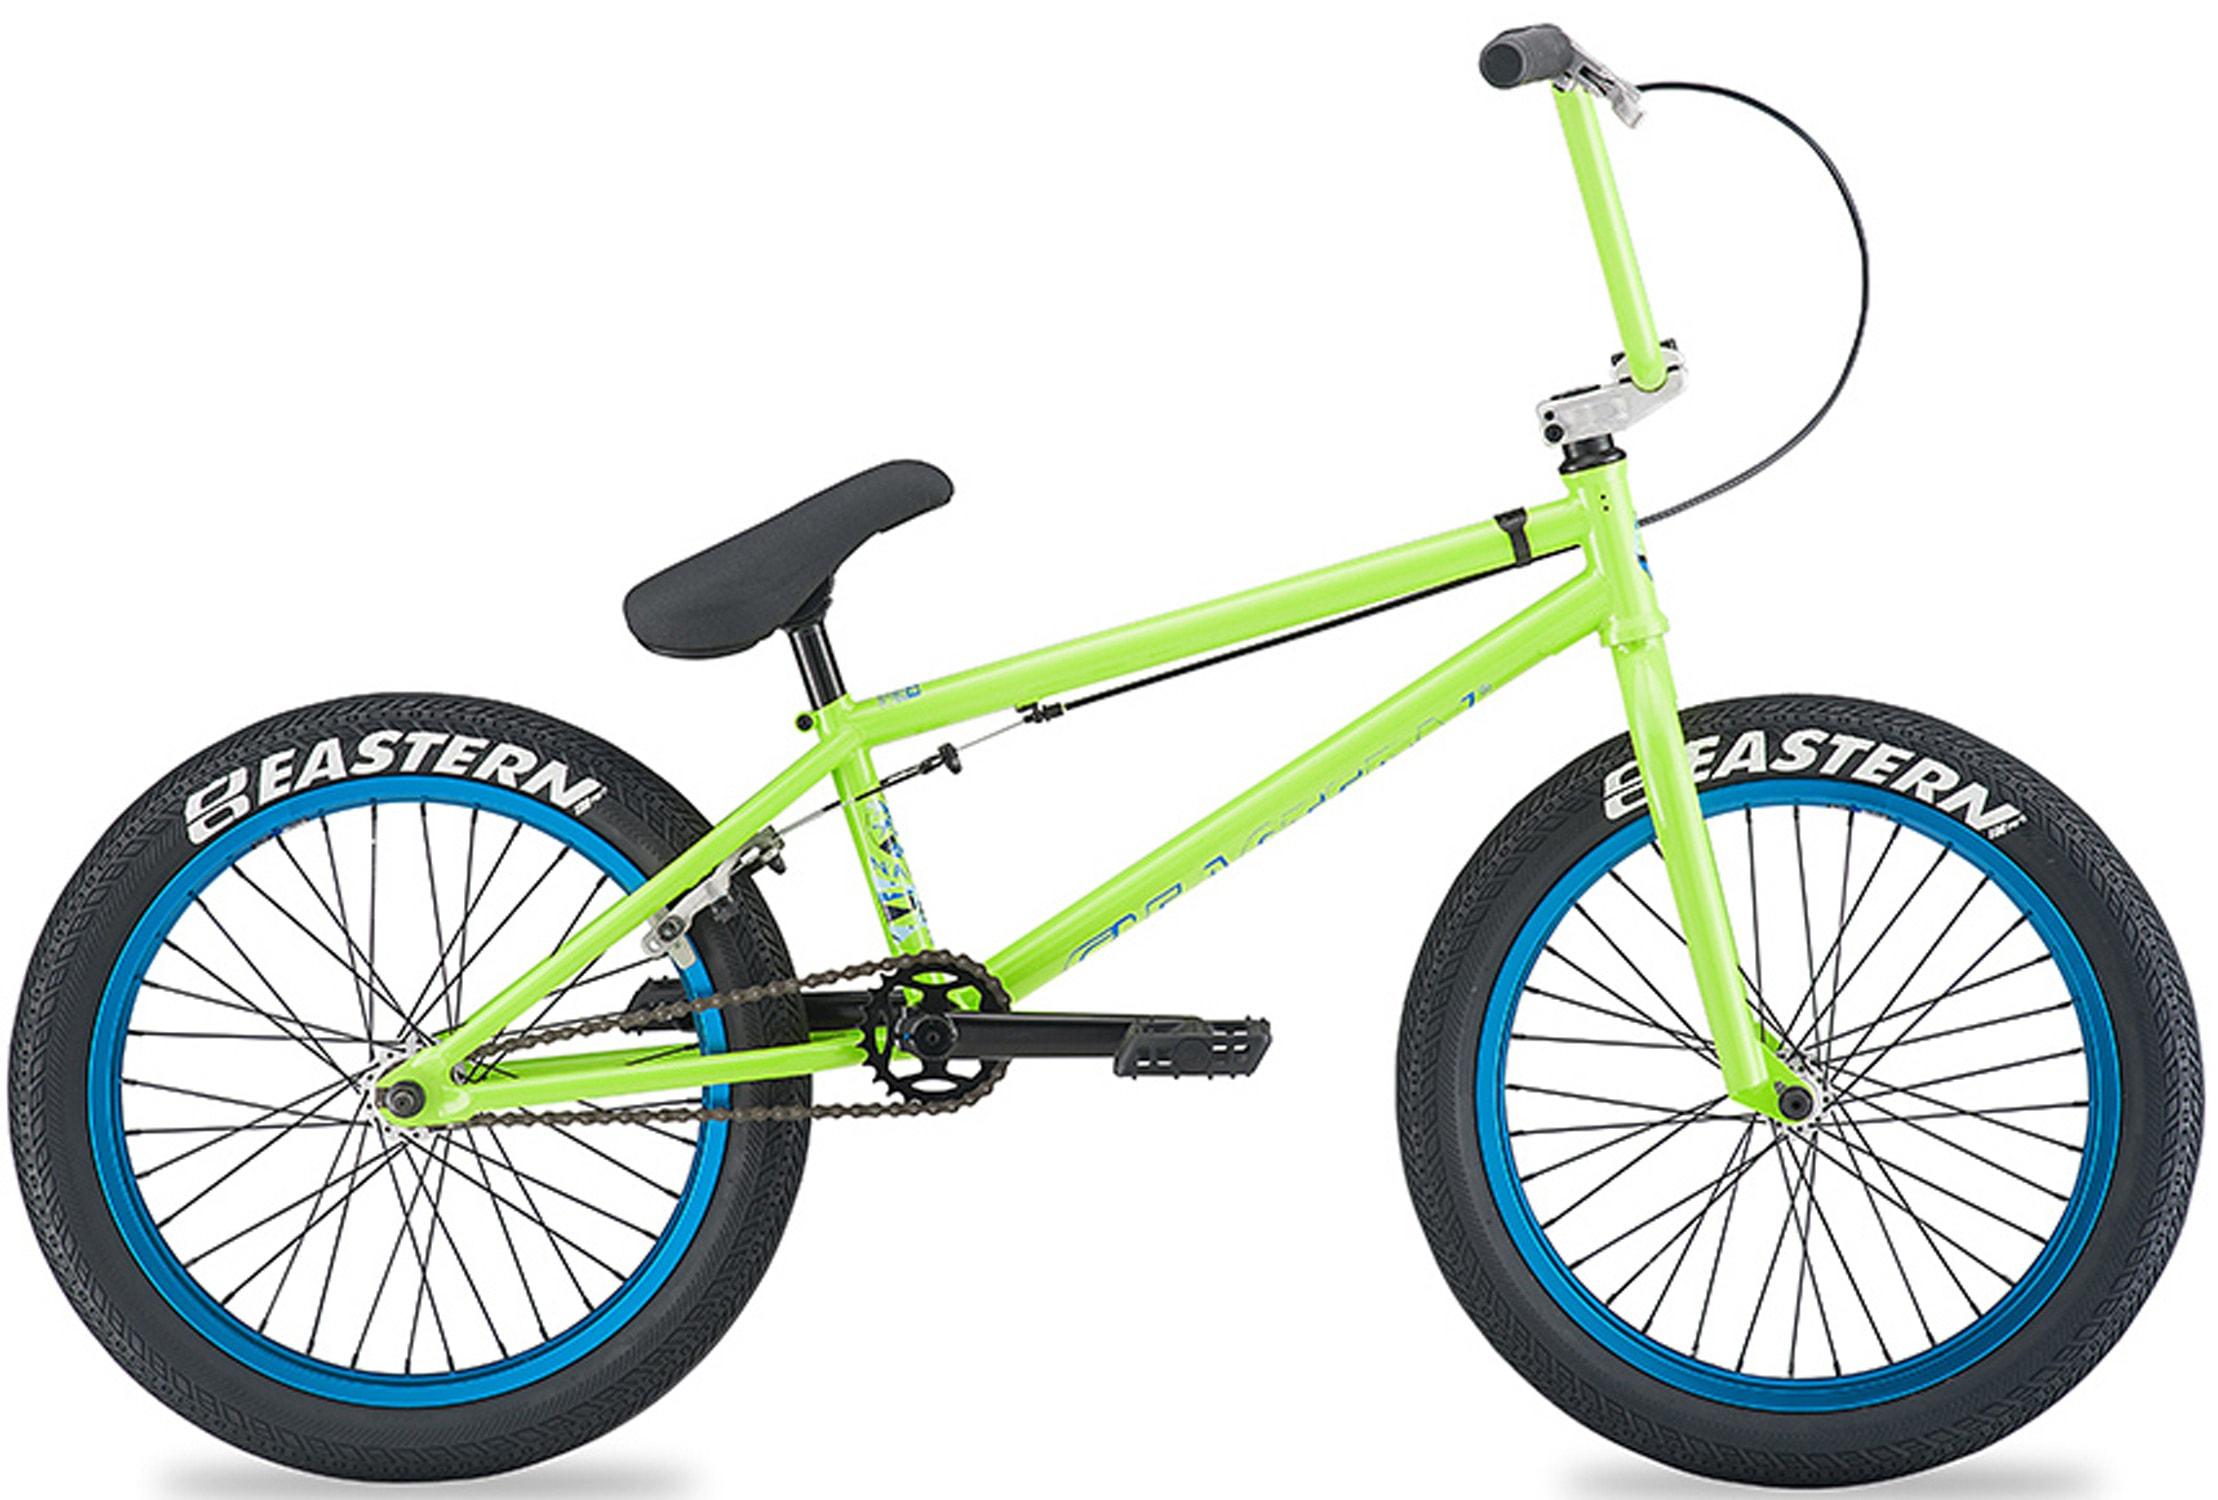 Image of Eastern Nagas BMX Bike